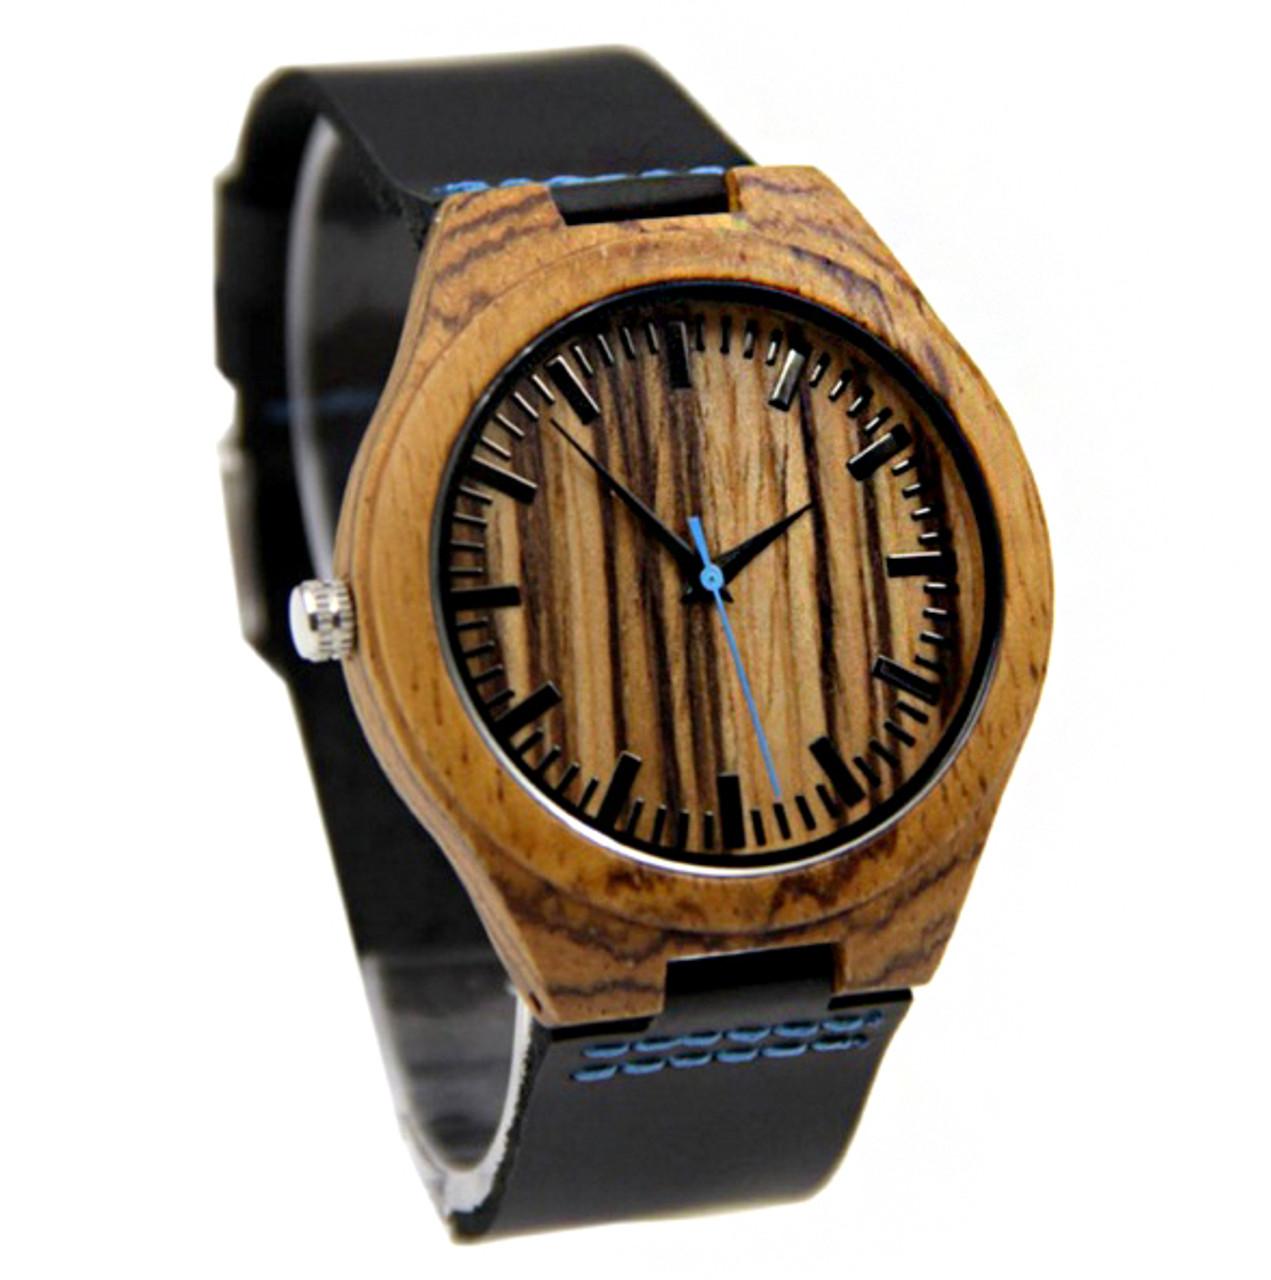 Grpn Spain - Wood Engraved Watch W#70 - Ocean